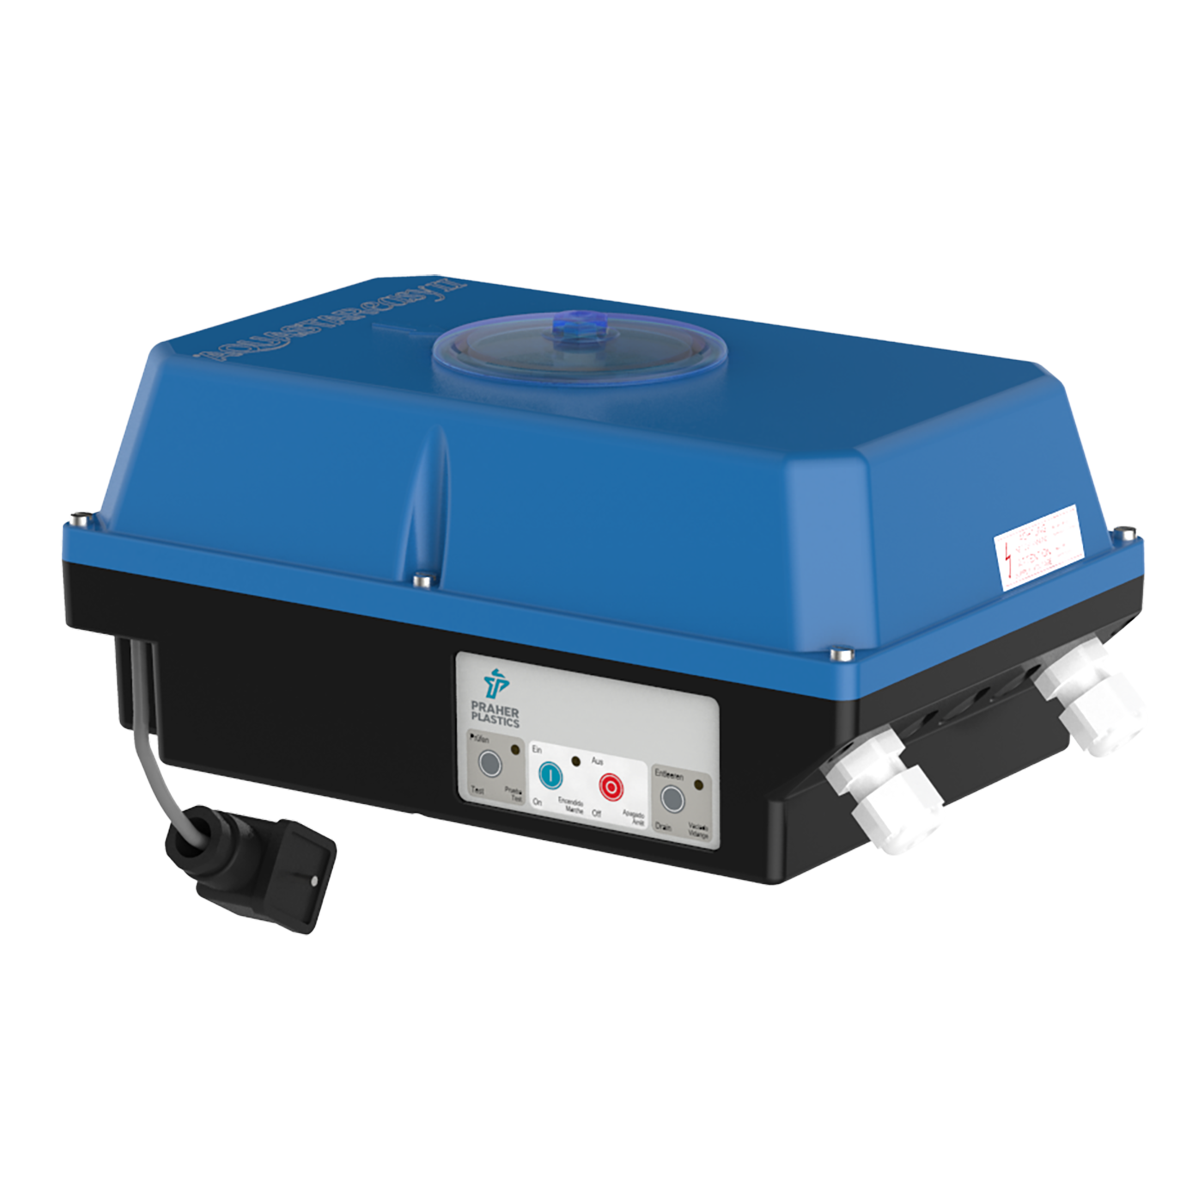 "AquaStar EasyII mit Drucksensor für V6 ND 1 ½"" + 2"" 100-240 VAC AquaStar EasyII mit Drucksensor für V6 ND 1 ½"" + 2"" 100-240 VAC"